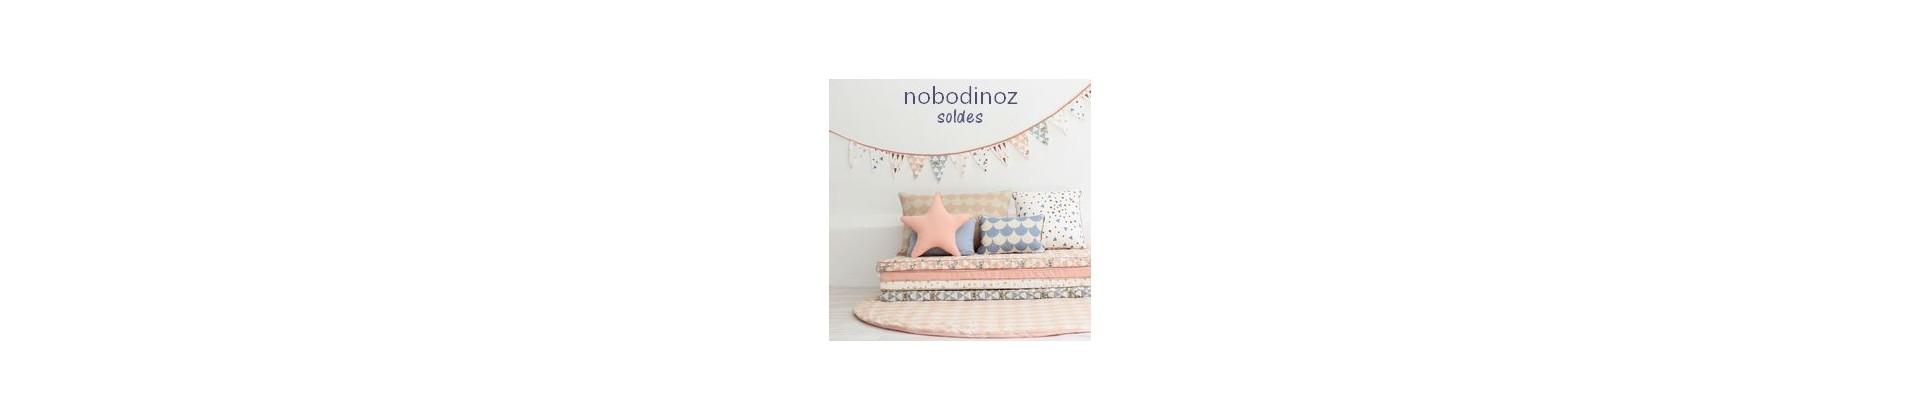 soldes nobodinoz - Achat/Vente Nobodinoz pas cher